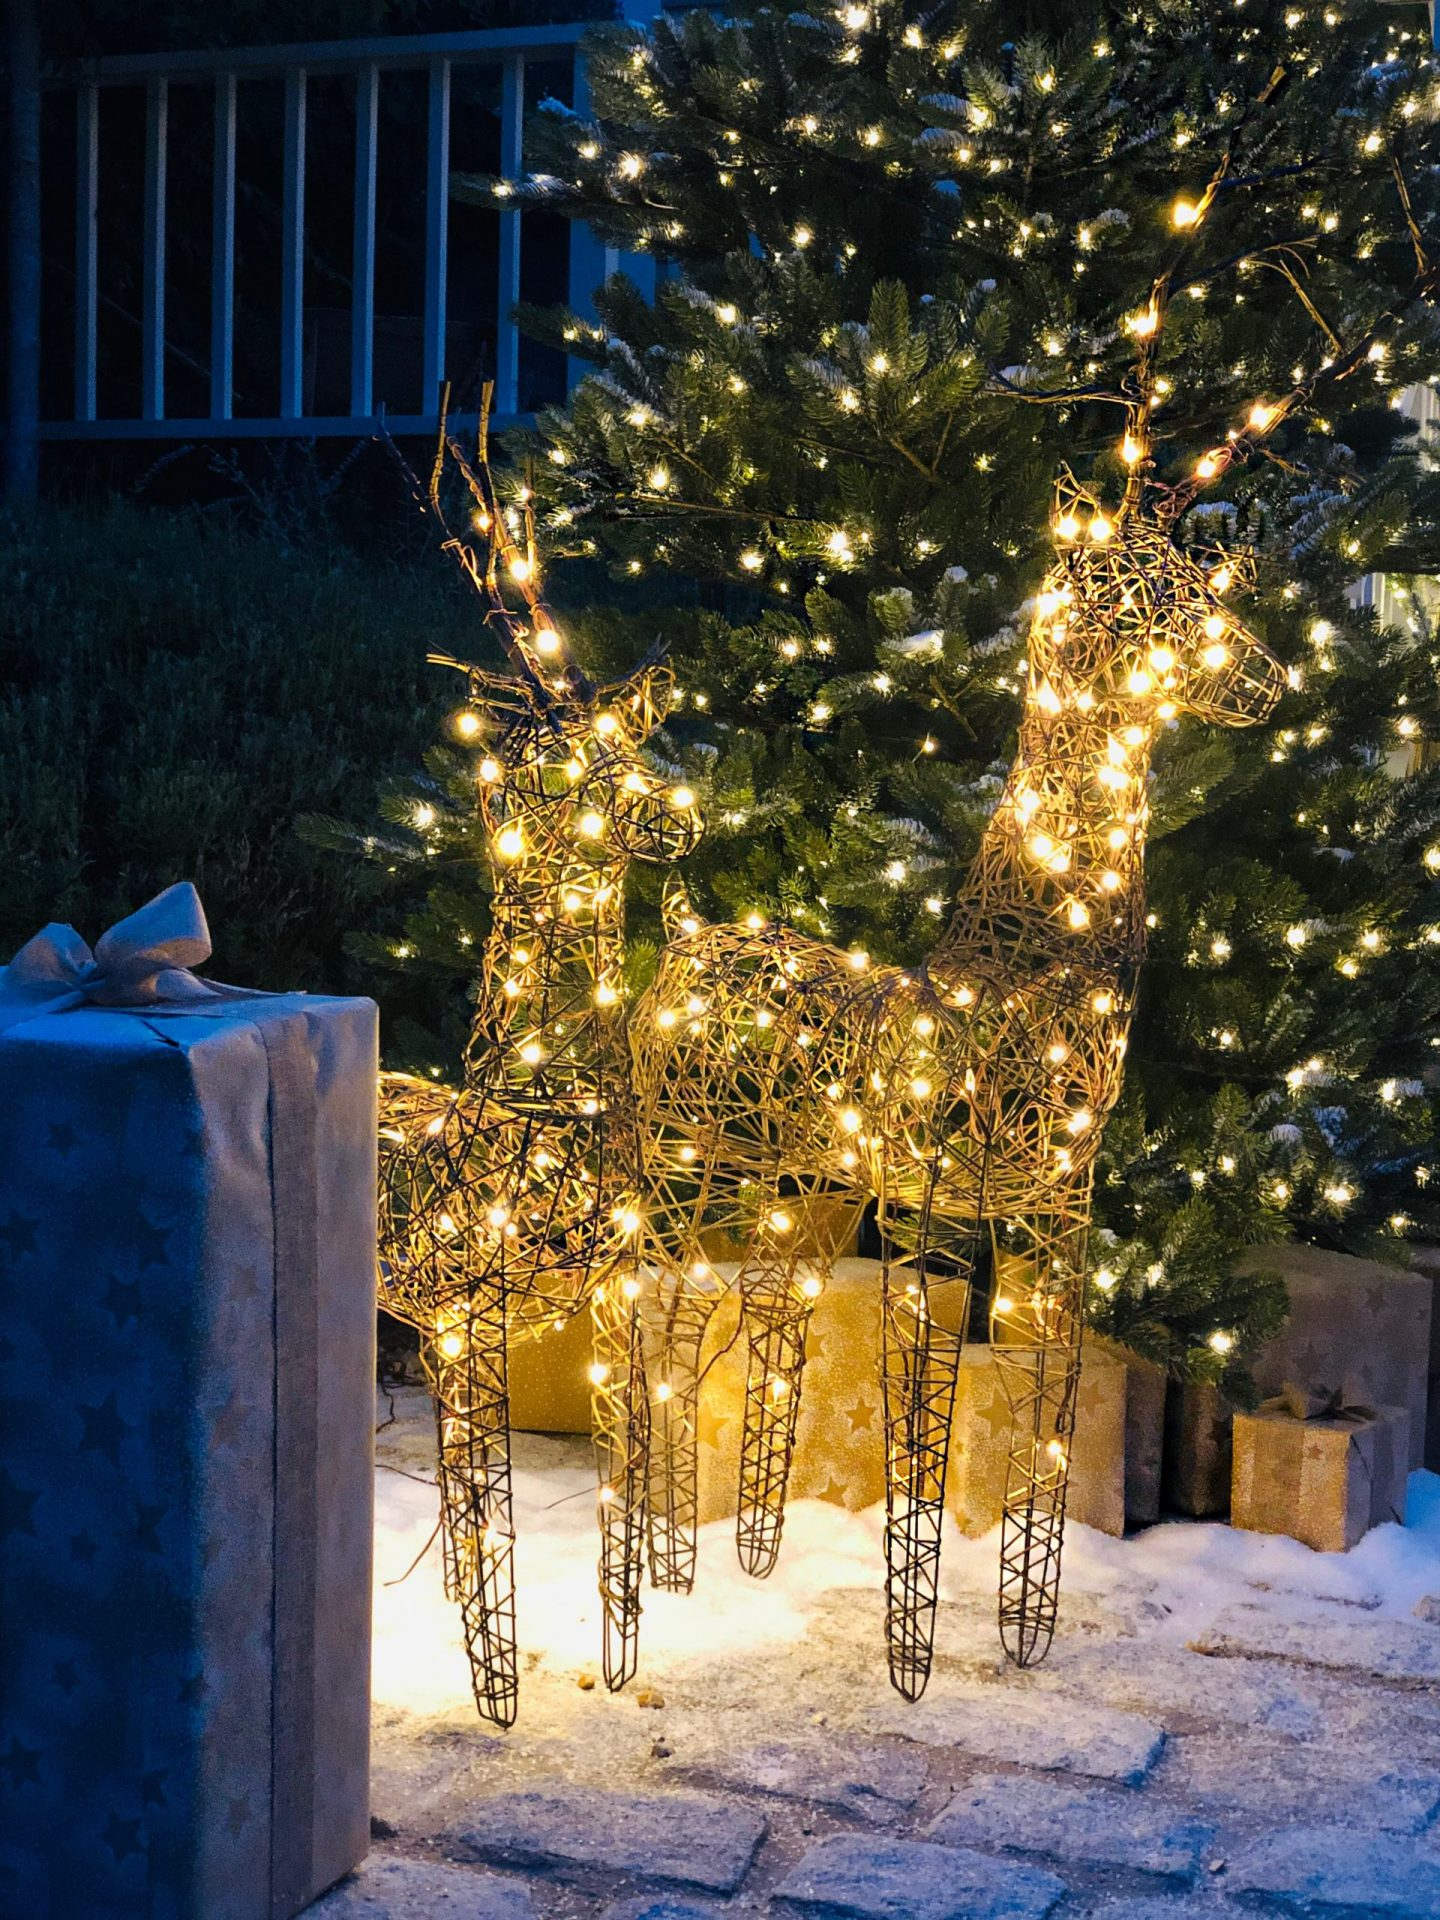 Light up reindeer by Cox & Cox